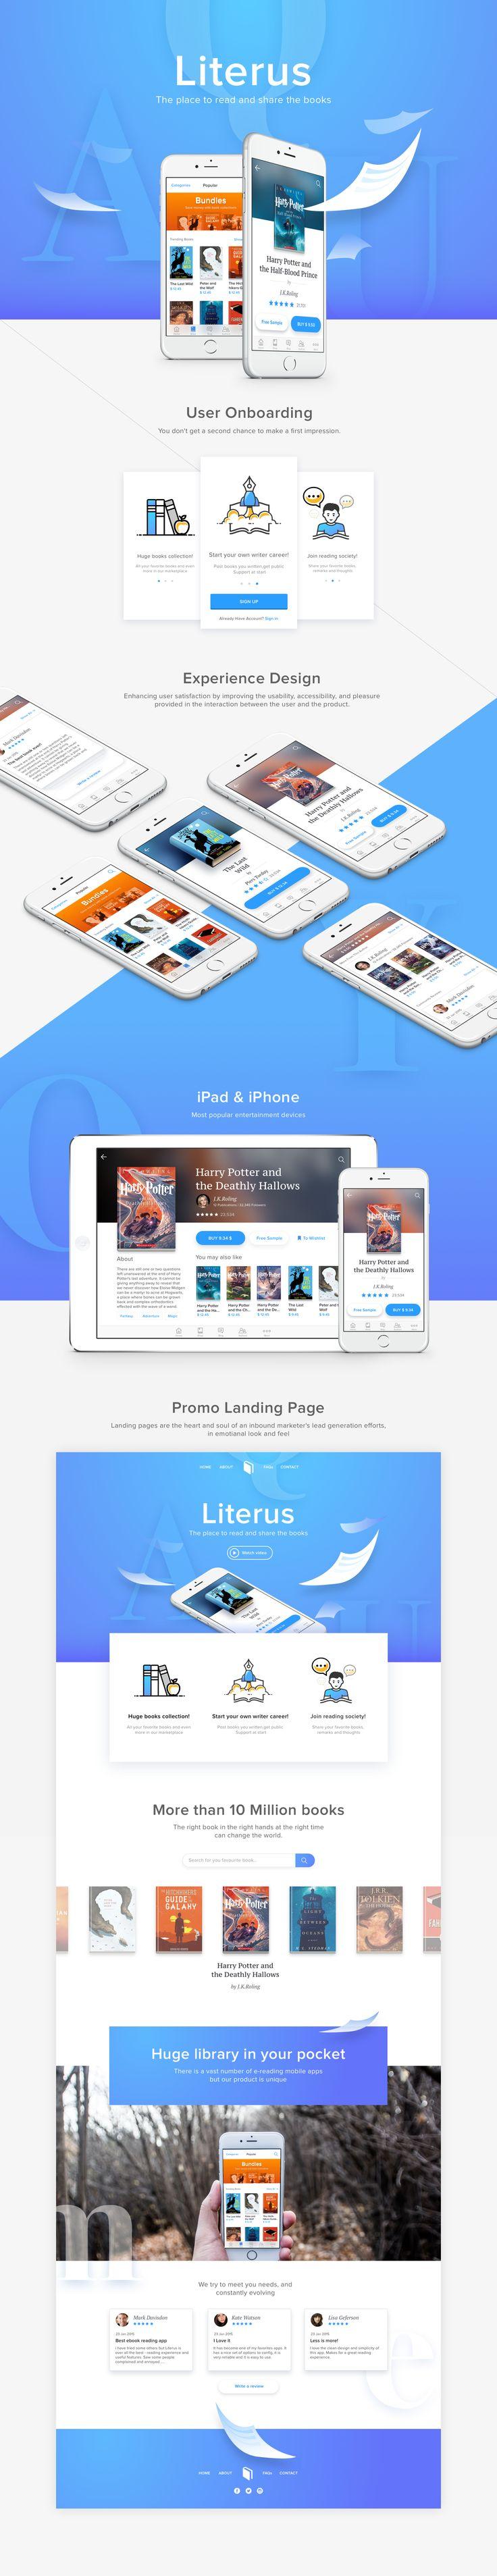 Literus App - UX/UI Concept on Behance